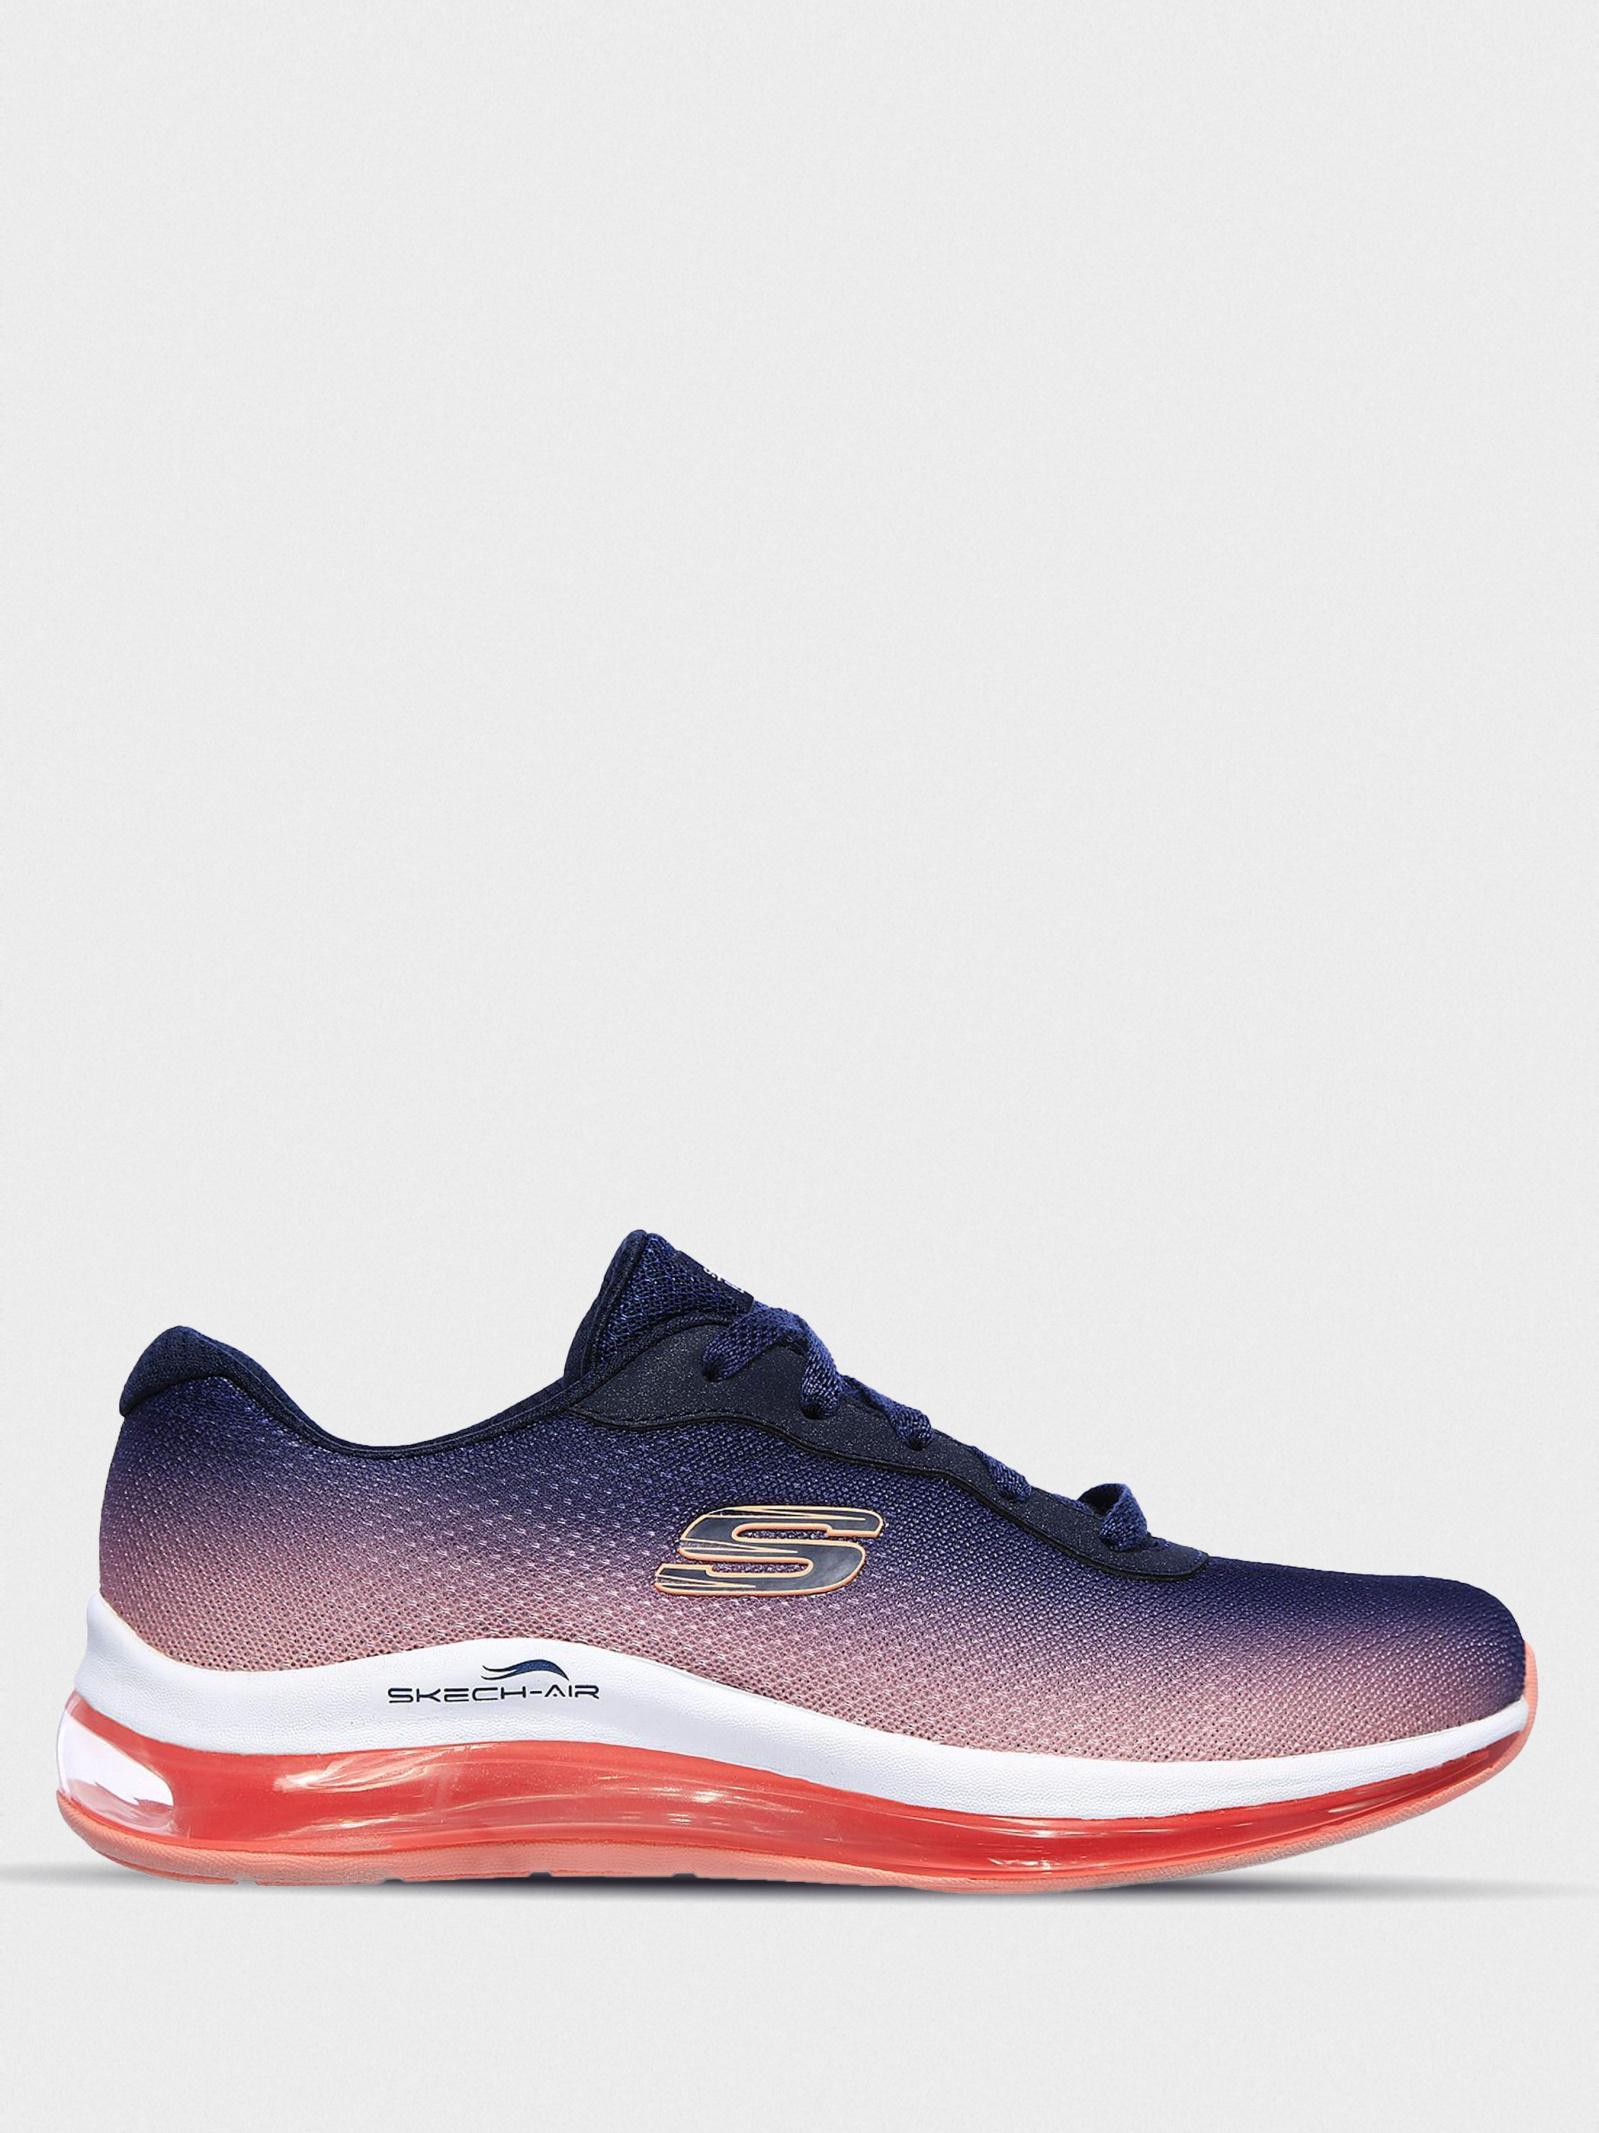 Кроссовки женские Skechers Skechers Womens Sport KW5447 модная обувь, 2017